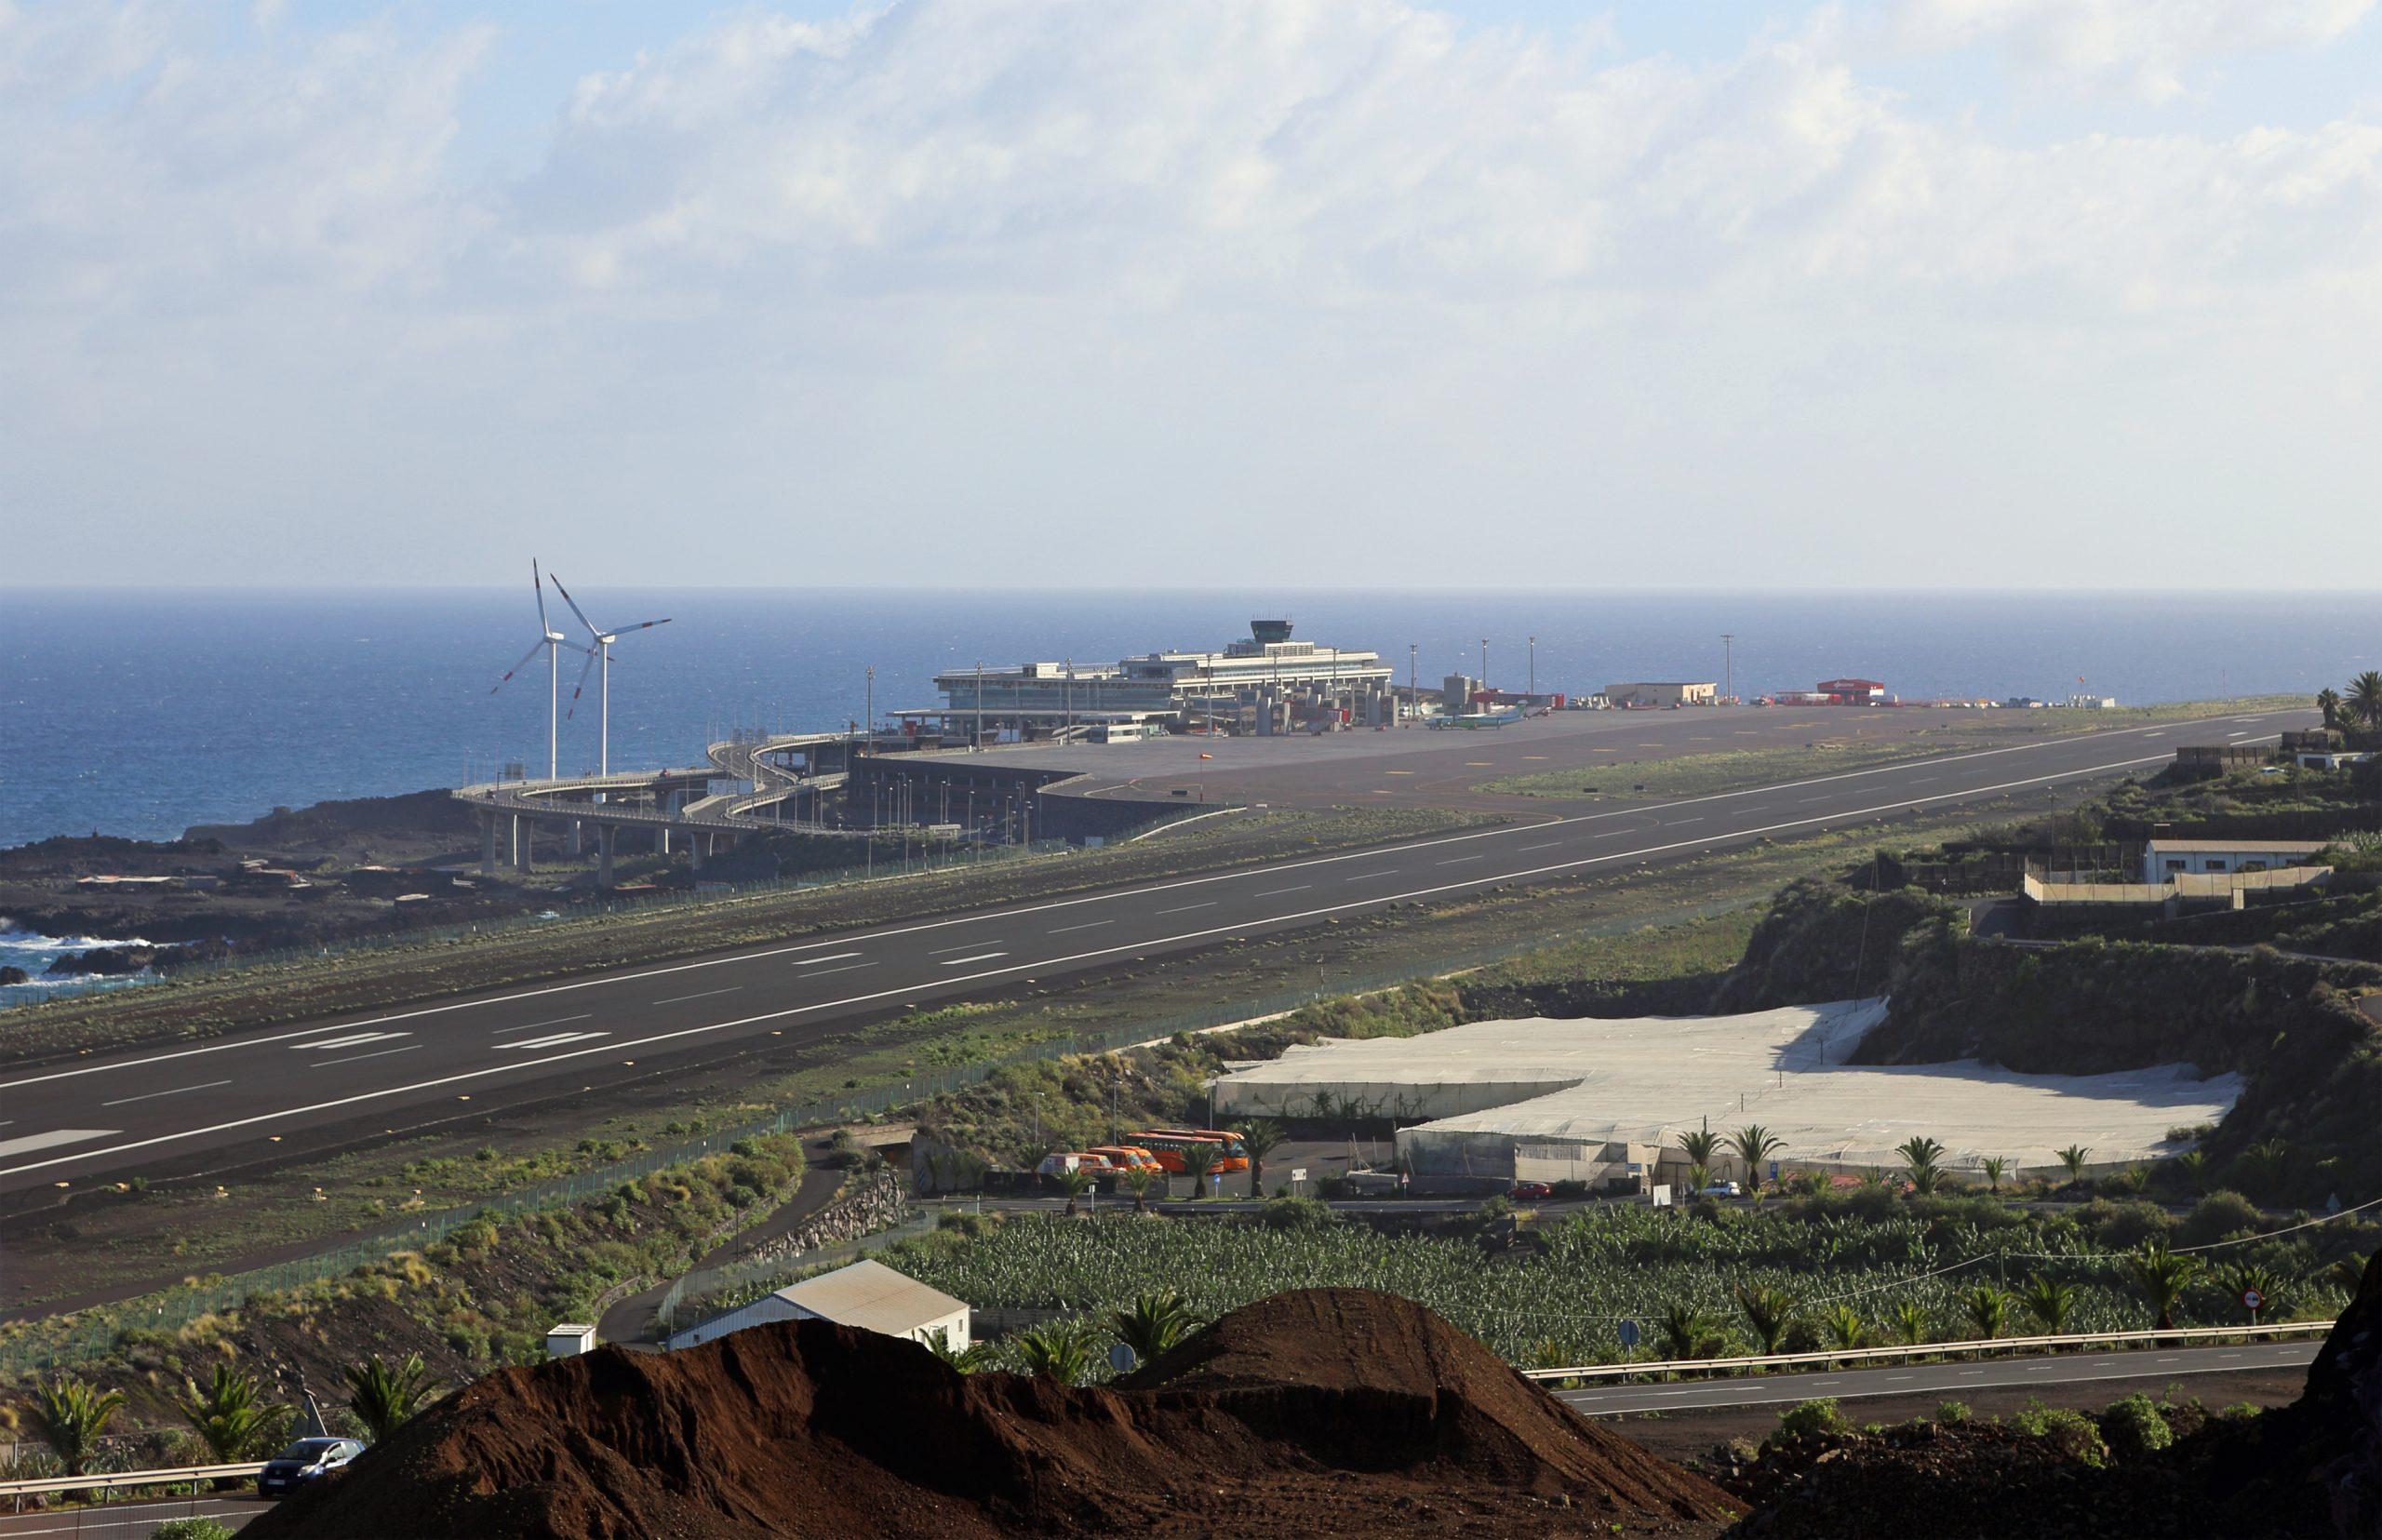 Den spanske lufthavn La Palma Airport. Foto: Marc Ryckaert, CC 3.0